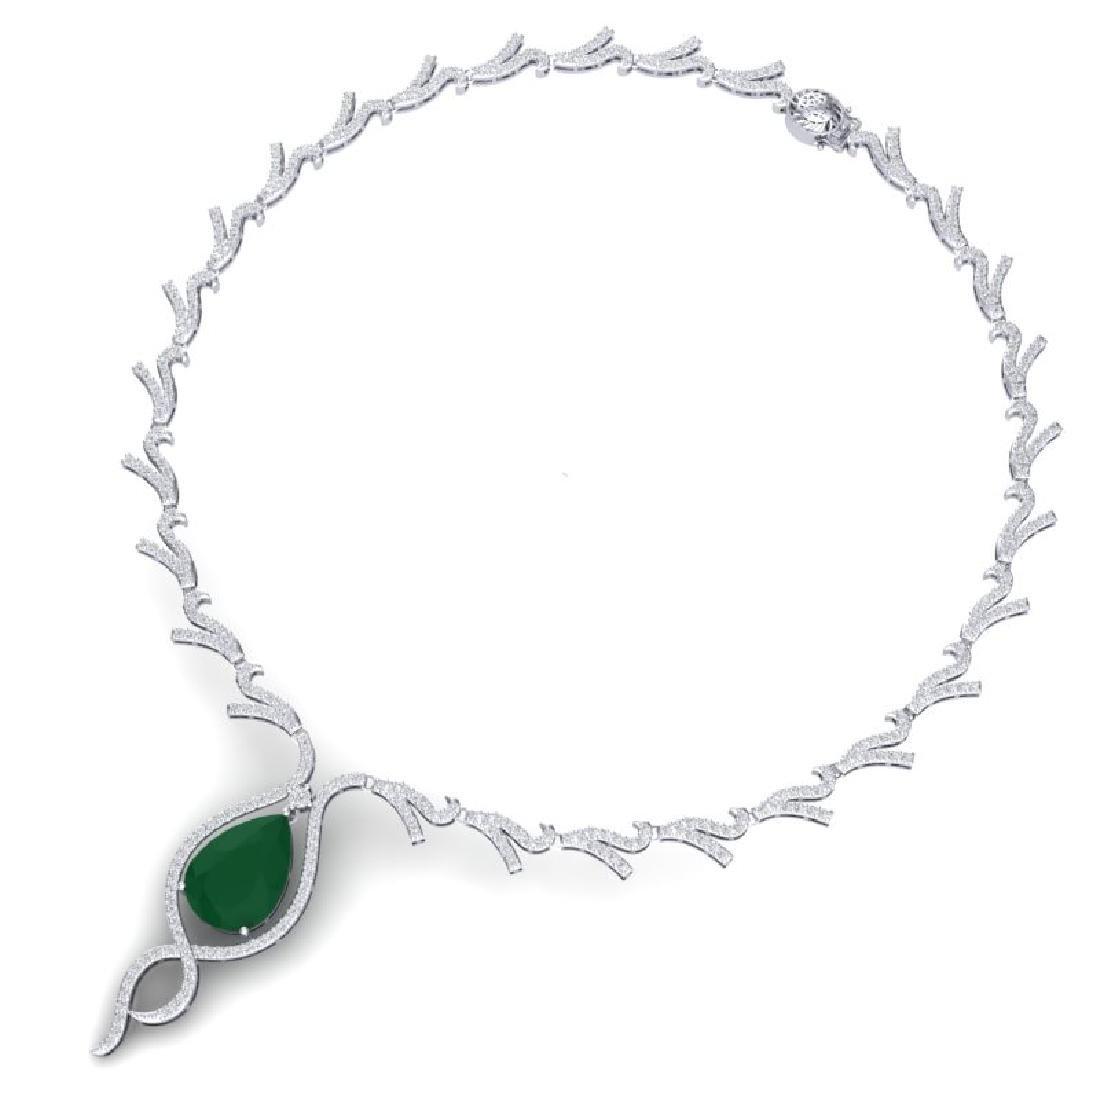 23.43 CTW Royalty Emerald & VS Diamond Necklace 18K - 3